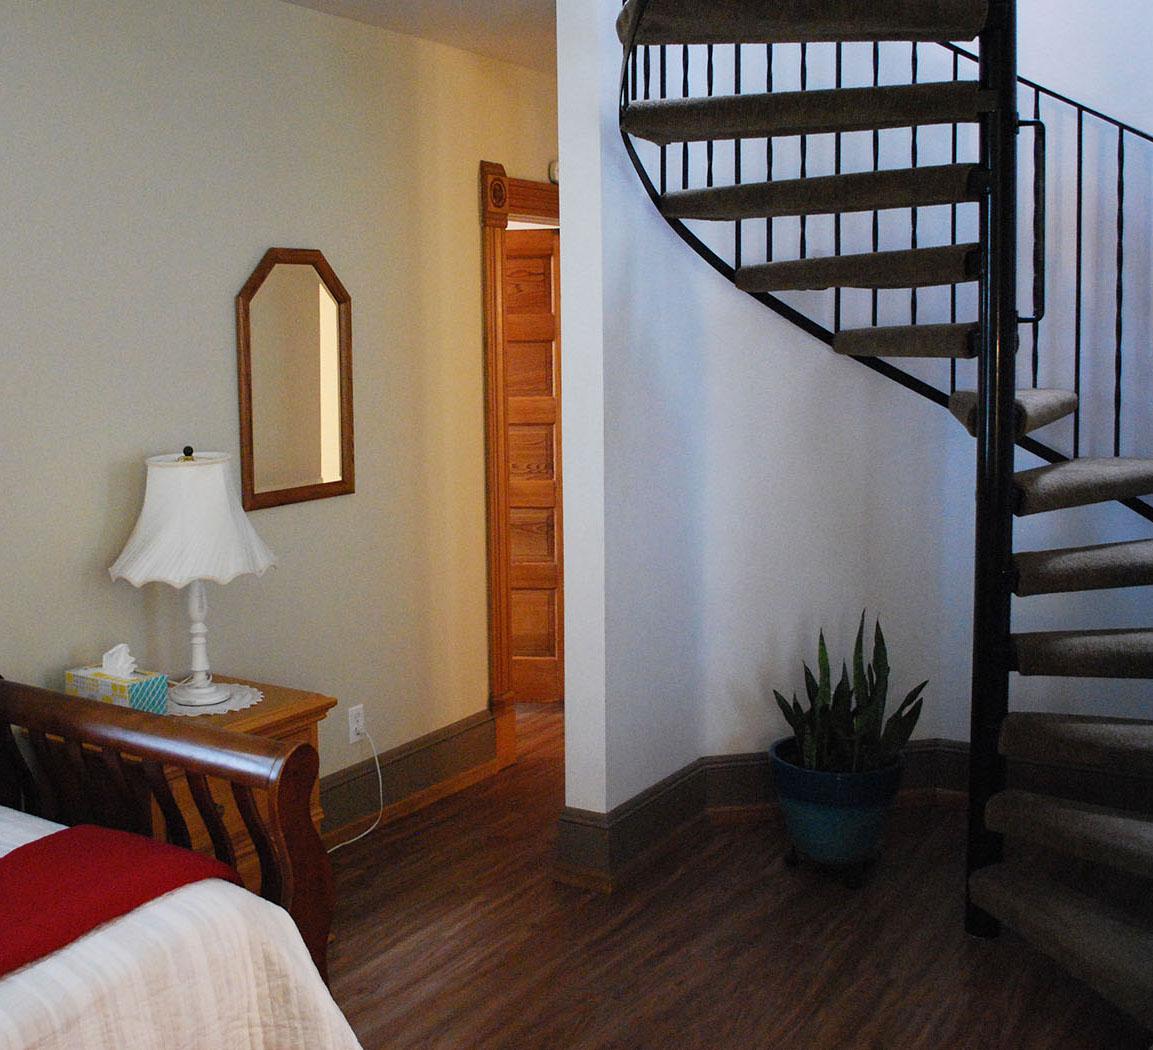 sherwin-spiral stairs